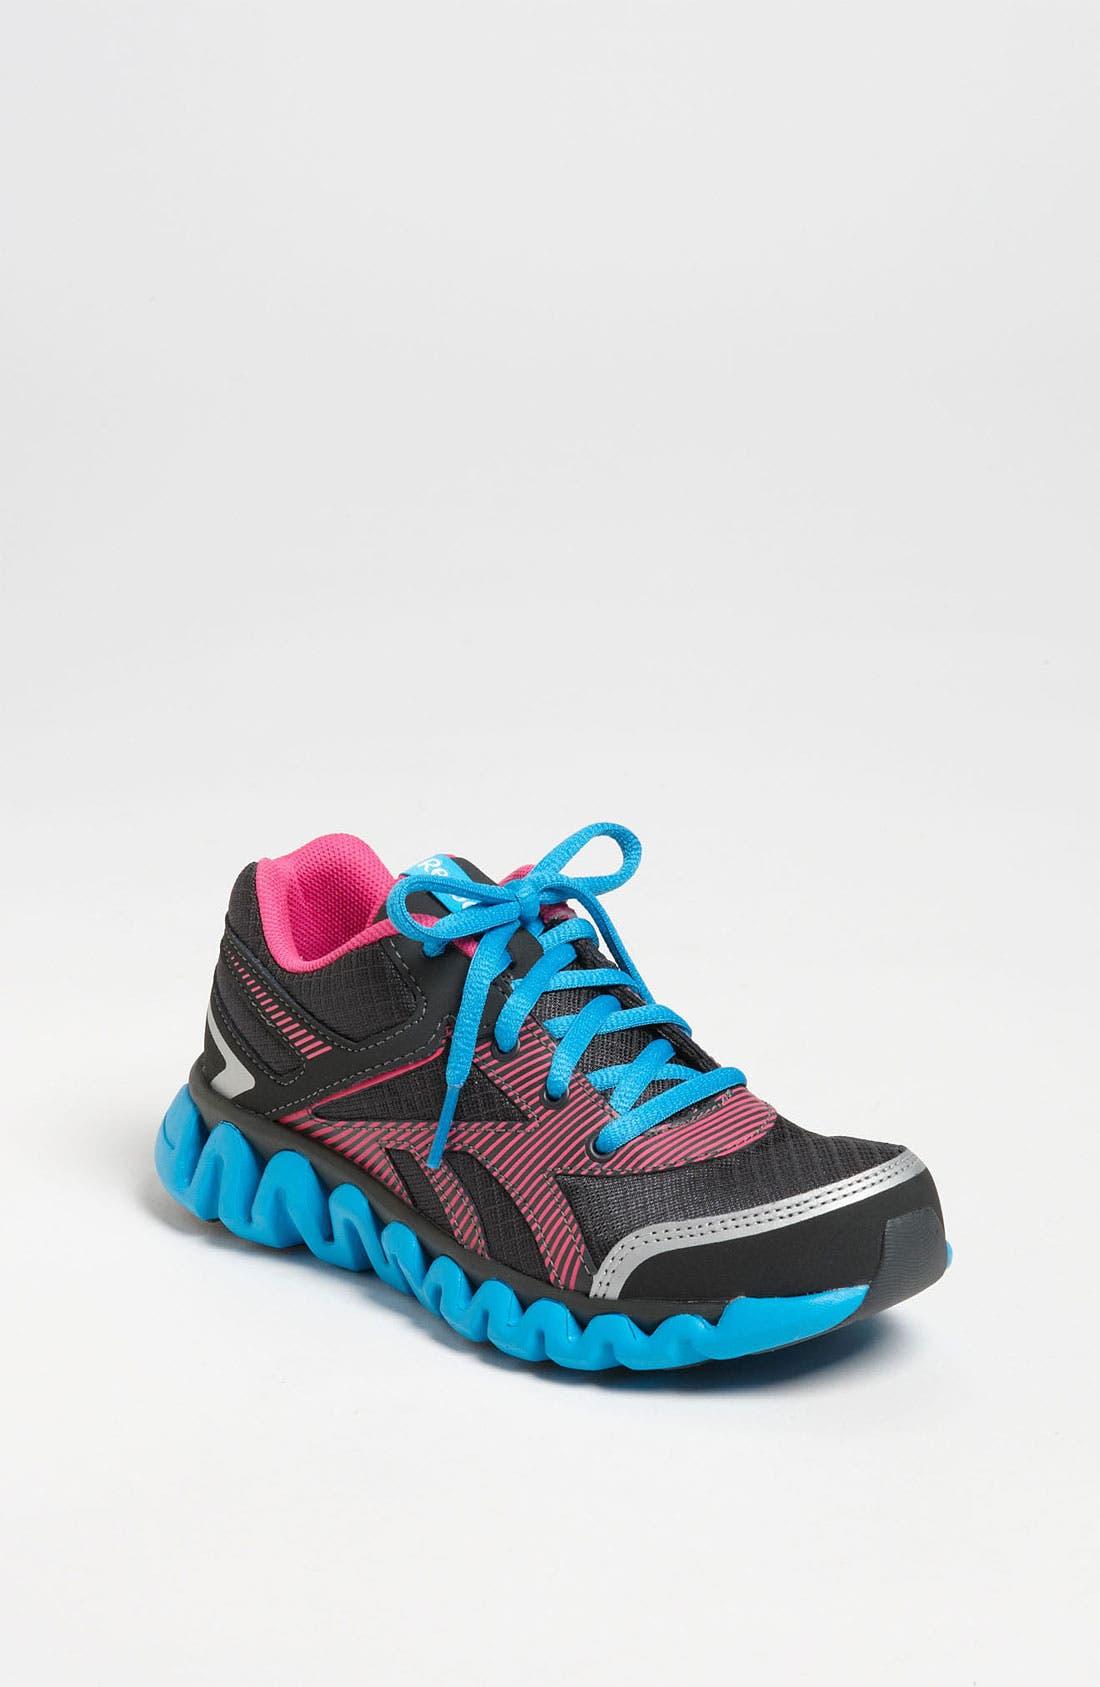 Alternate Image 1 Selected - Reebok 'ZigLite Electrify' Sneaker (Toddler, Little Kid & Big Kid)